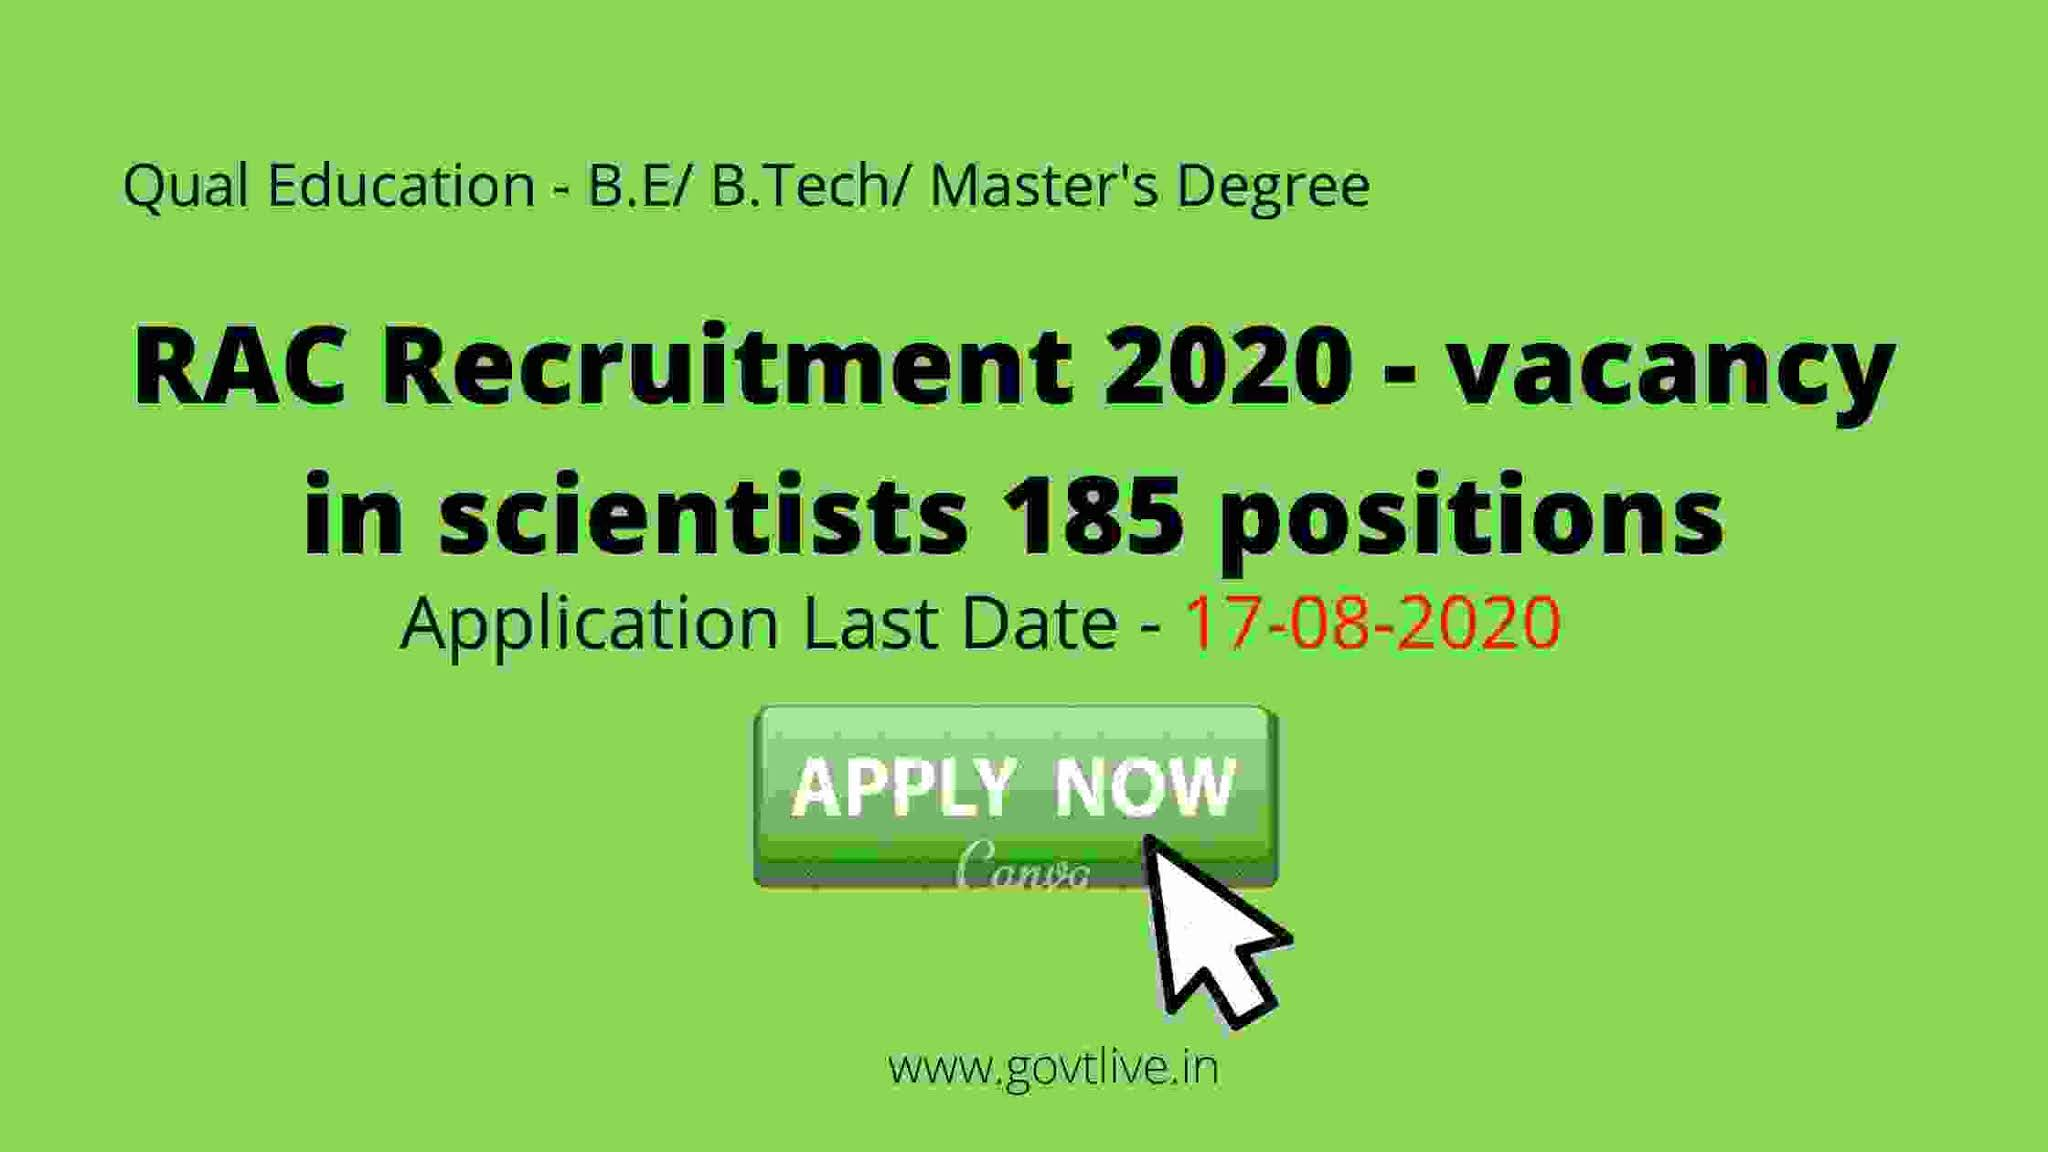 RAC Recruitment 2020 - vacancy in scientists 185 positions